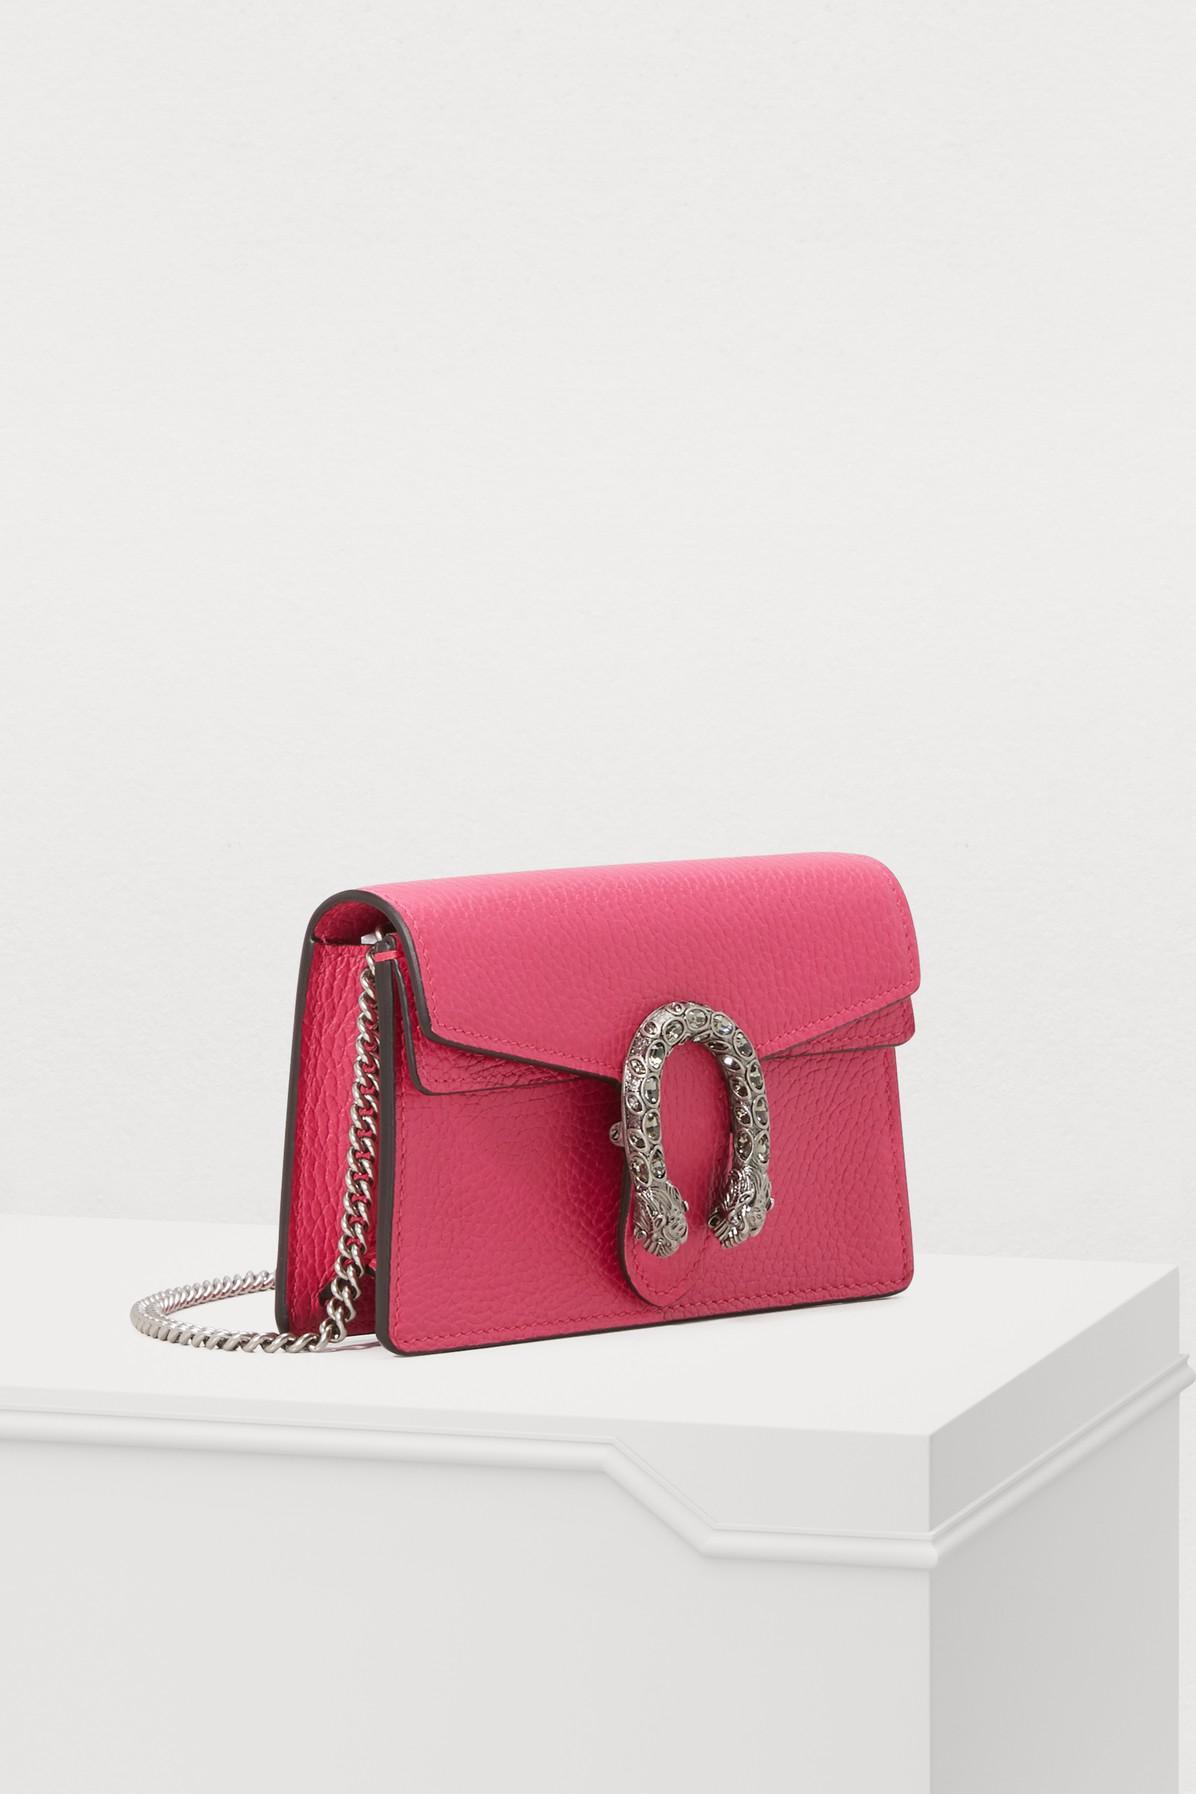 87043a39fee Gucci - Multicolor Dionysus Velvet Super Mini Bag With Crystals - Lyst.  View fullscreen